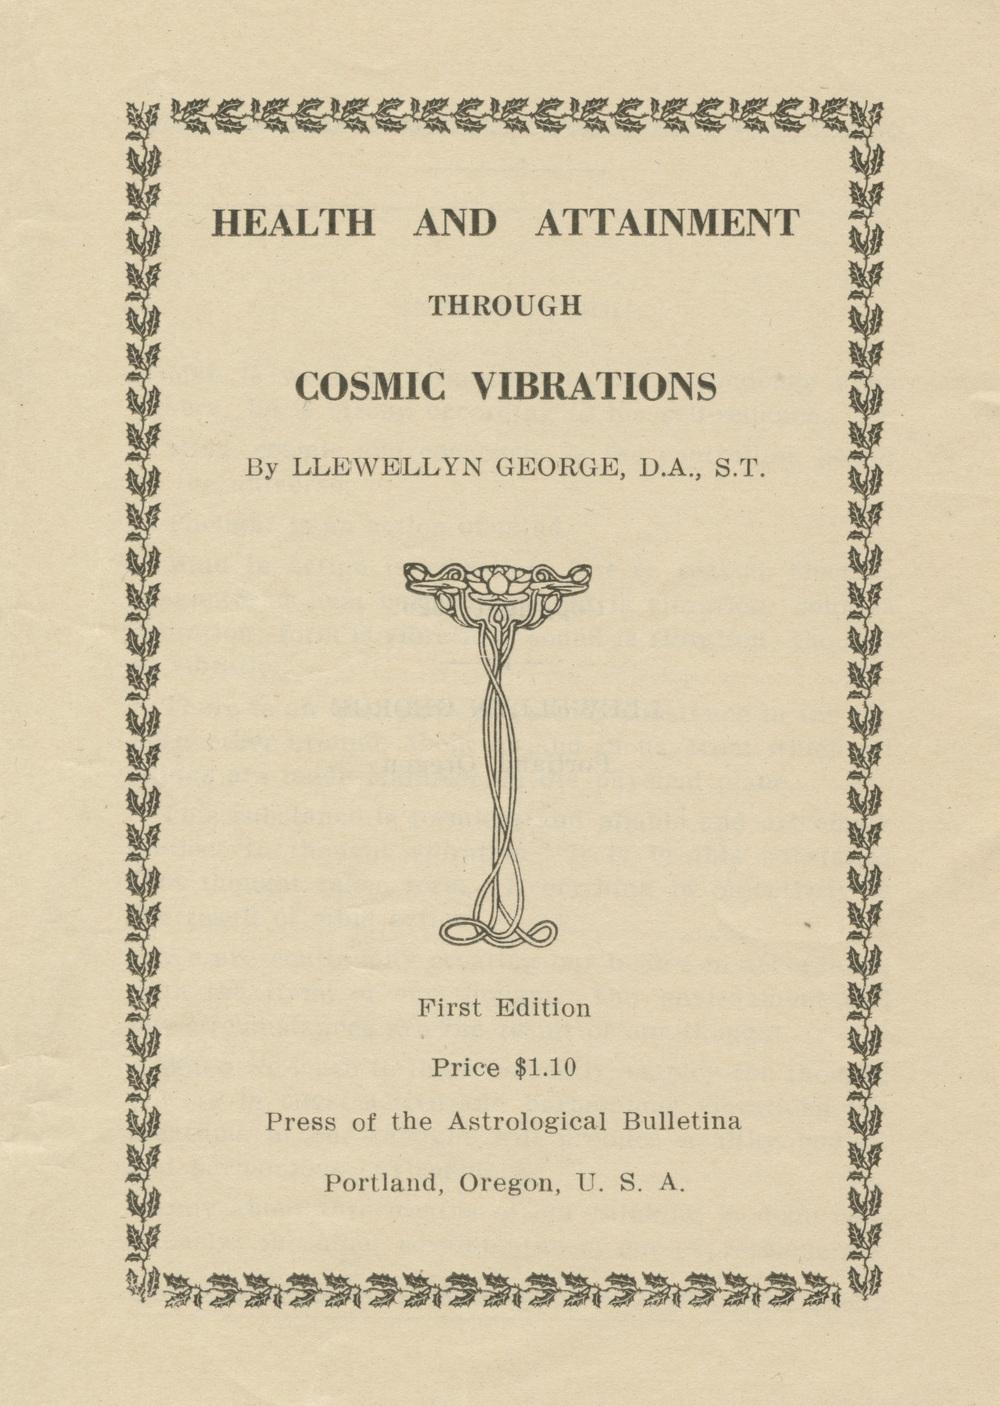 cosmic_vibrations_02.jpg